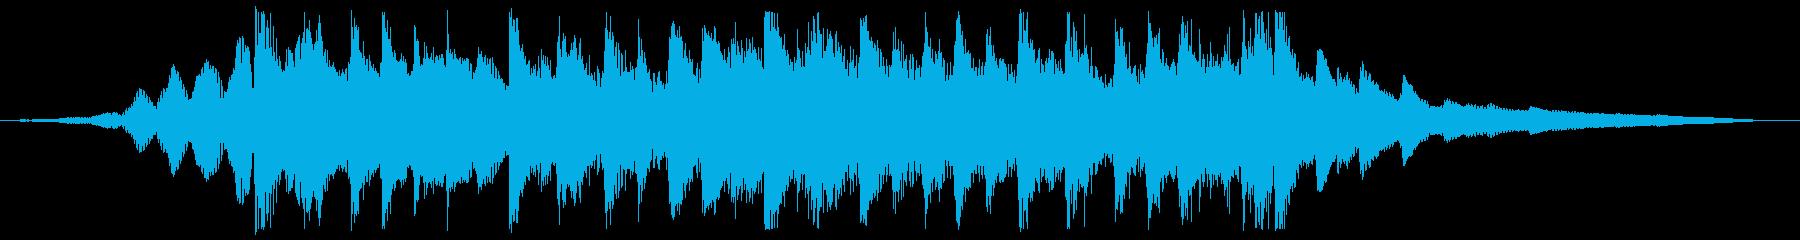 CM用14秒、次世代、スタイリッシュ製品の再生済みの波形